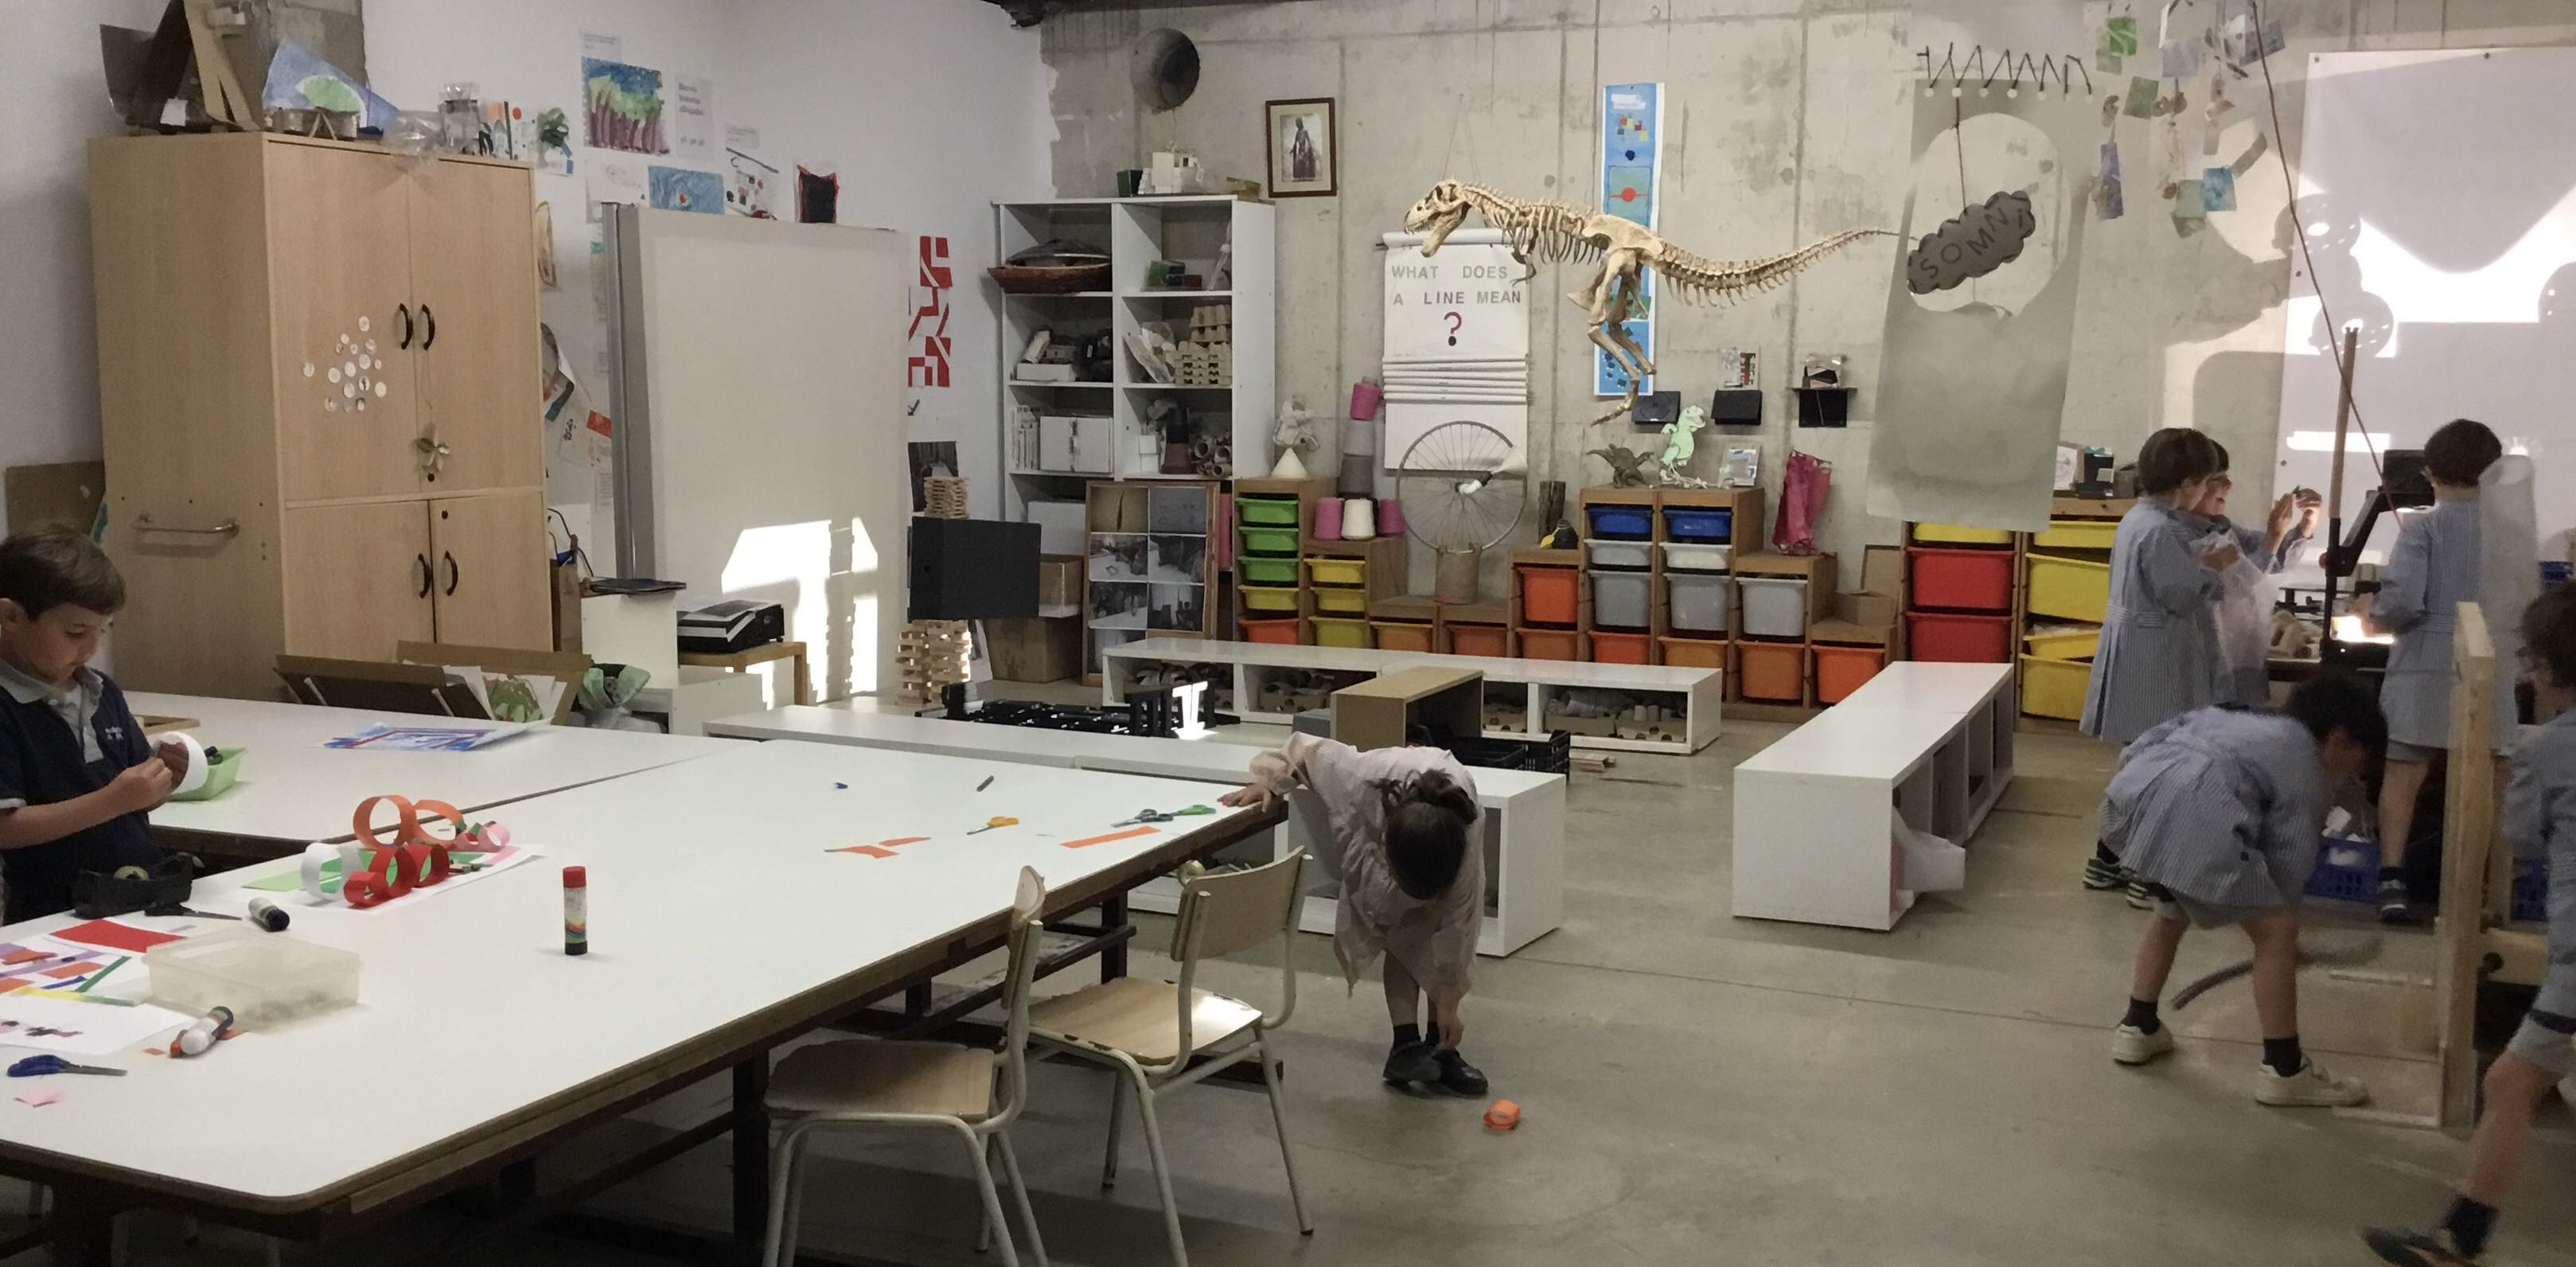 Atelier, Studio: Artencurs